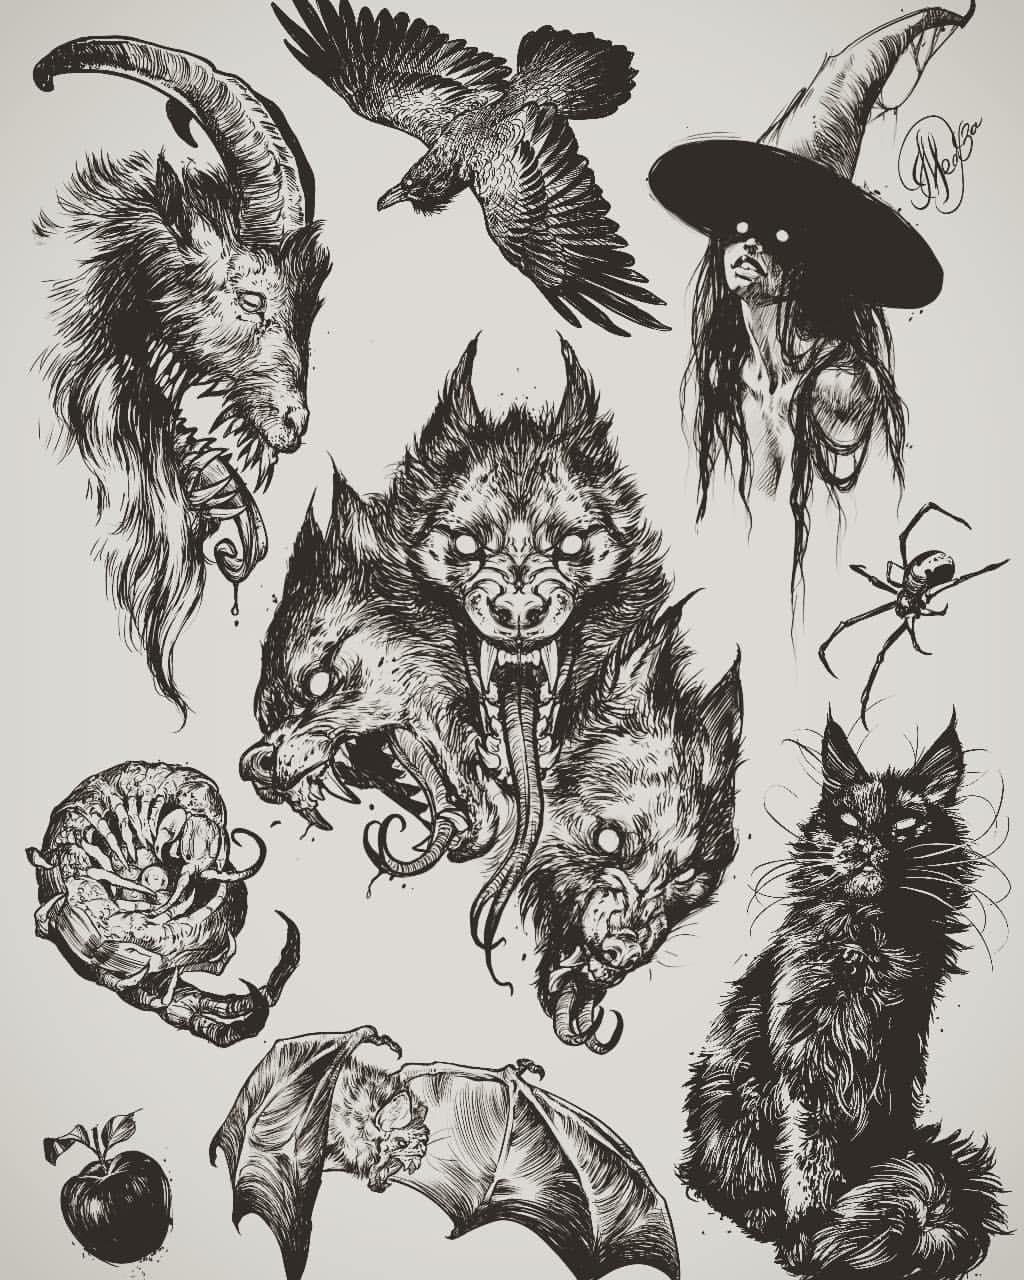 95 Otmetok Nravitsya 4 Kommentariev Tattoo Ink Class Tattooinkclass V Instagram Halloween Sketches Dark Tattoo Sketches Traditional Tattoo Sleeve